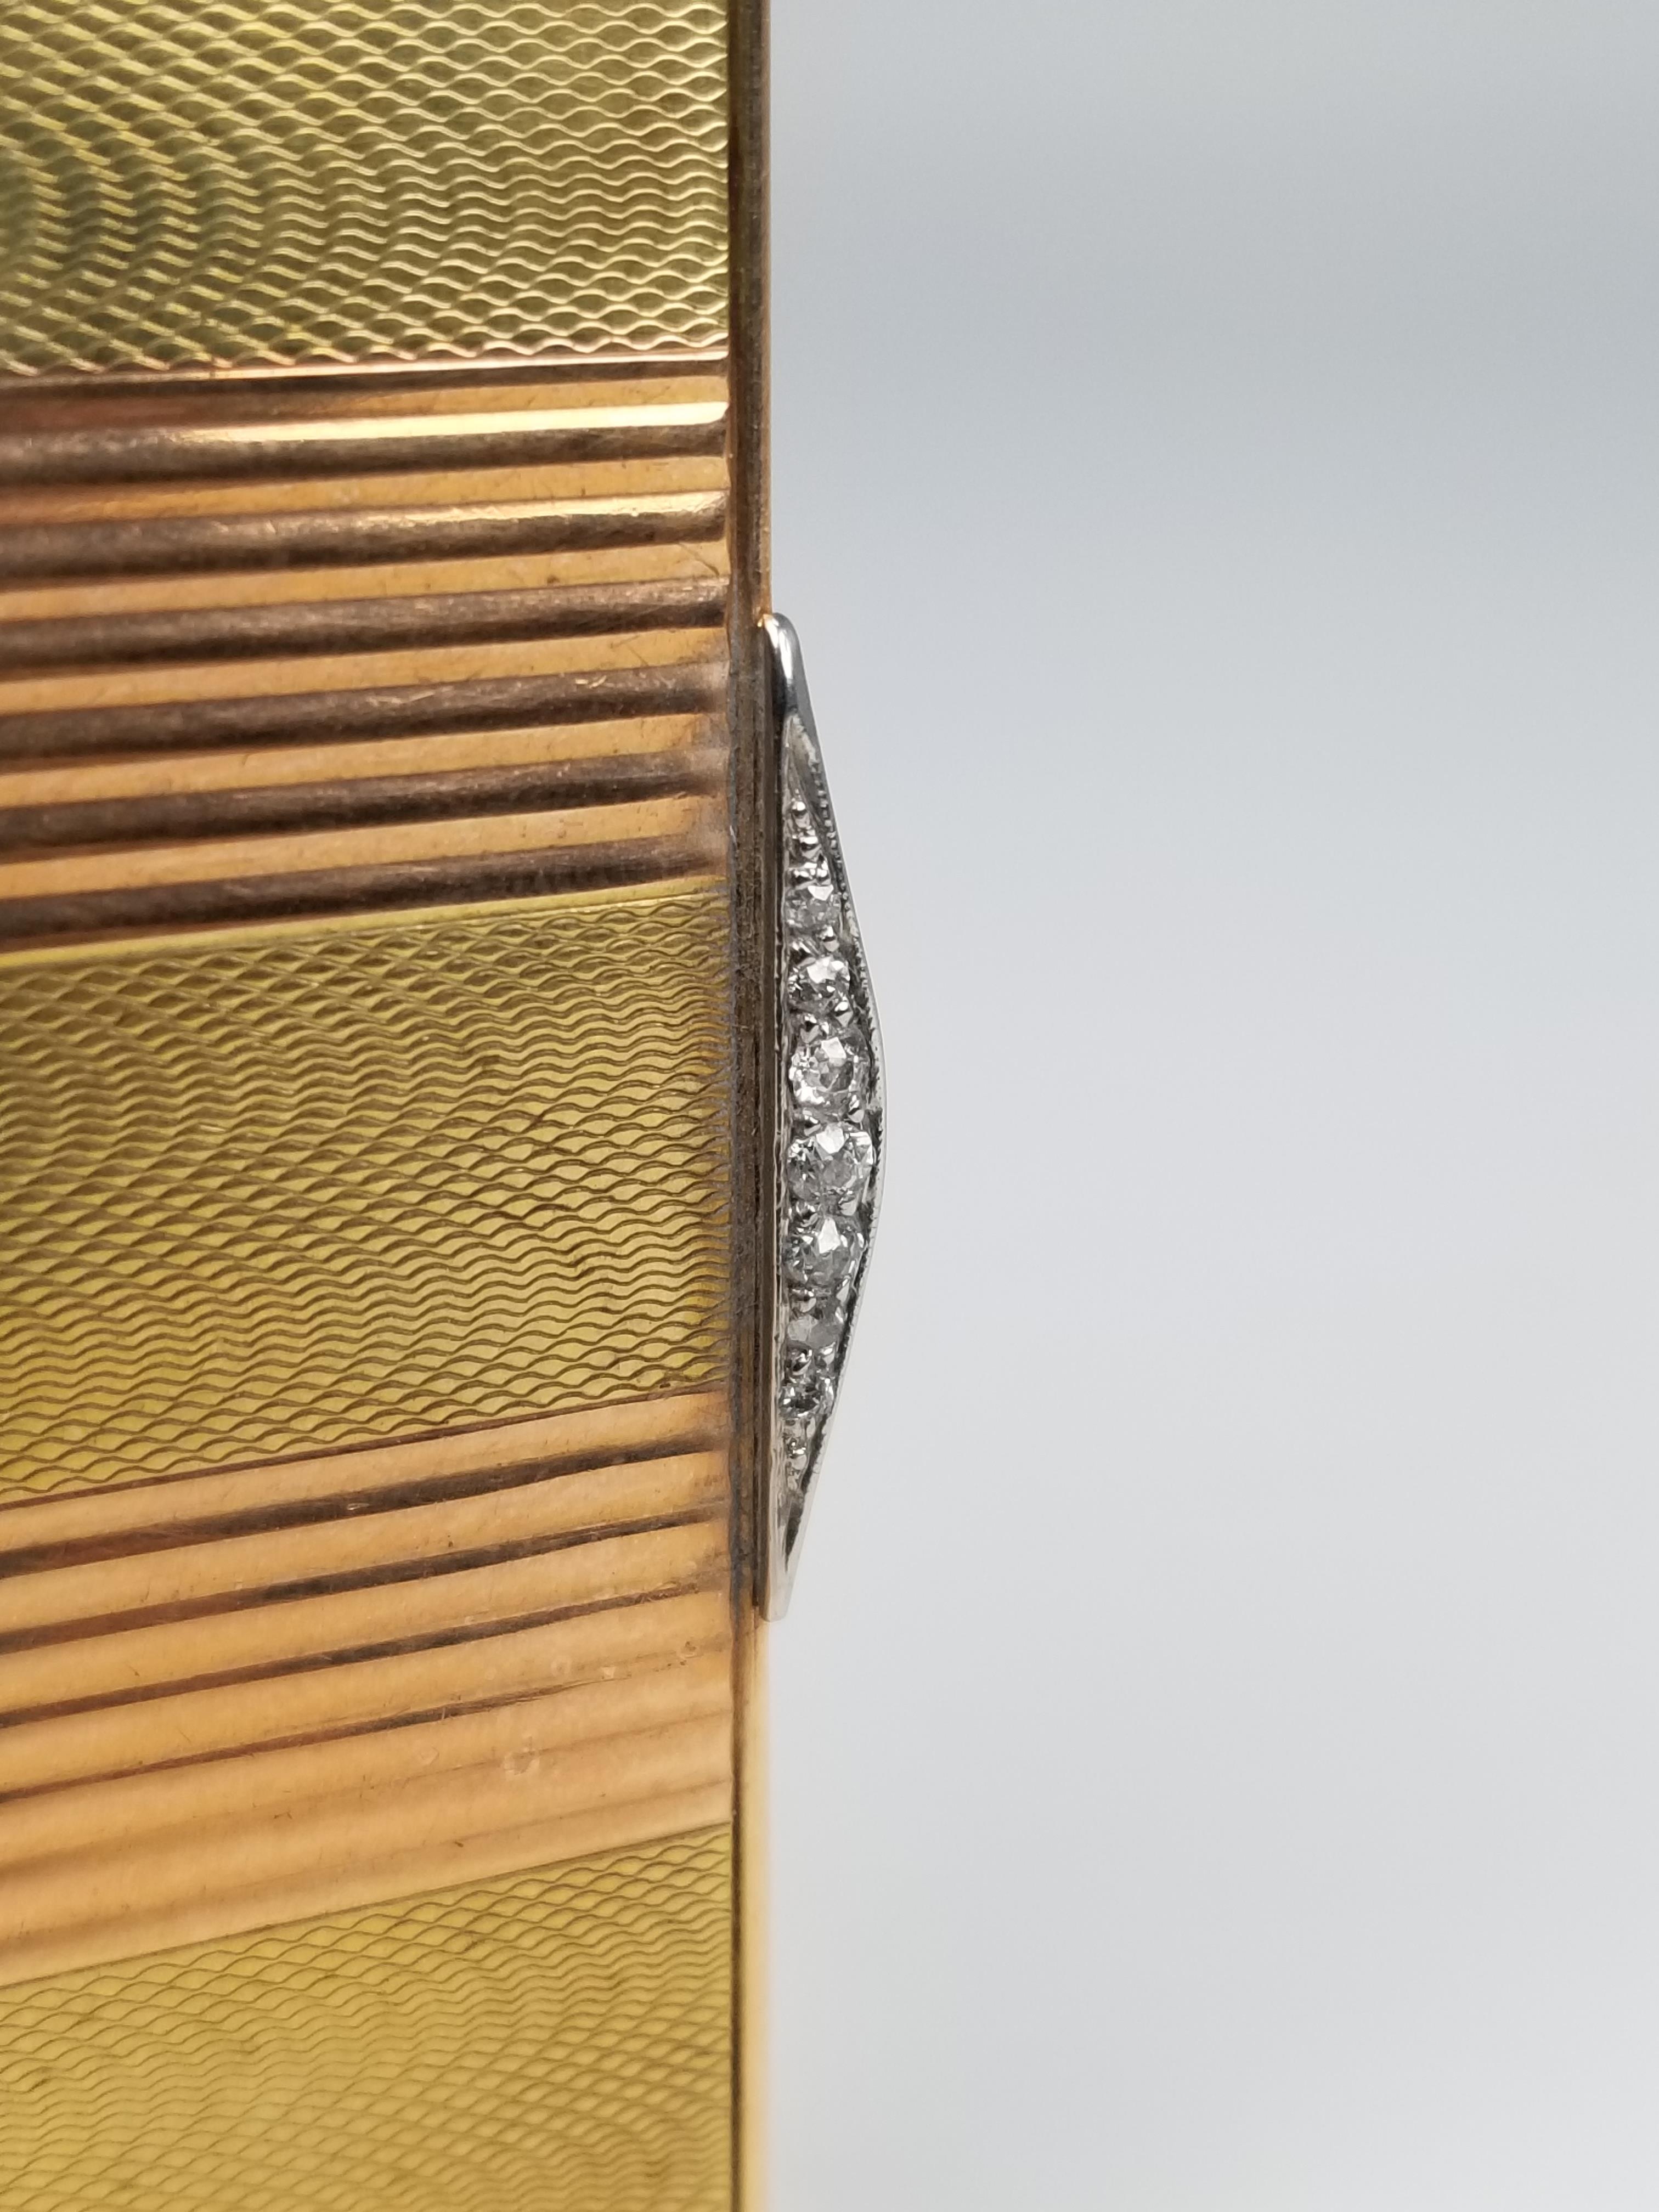 Lot 36 - Art Deco 14k Gold Charlton & Co. Cigarette Case